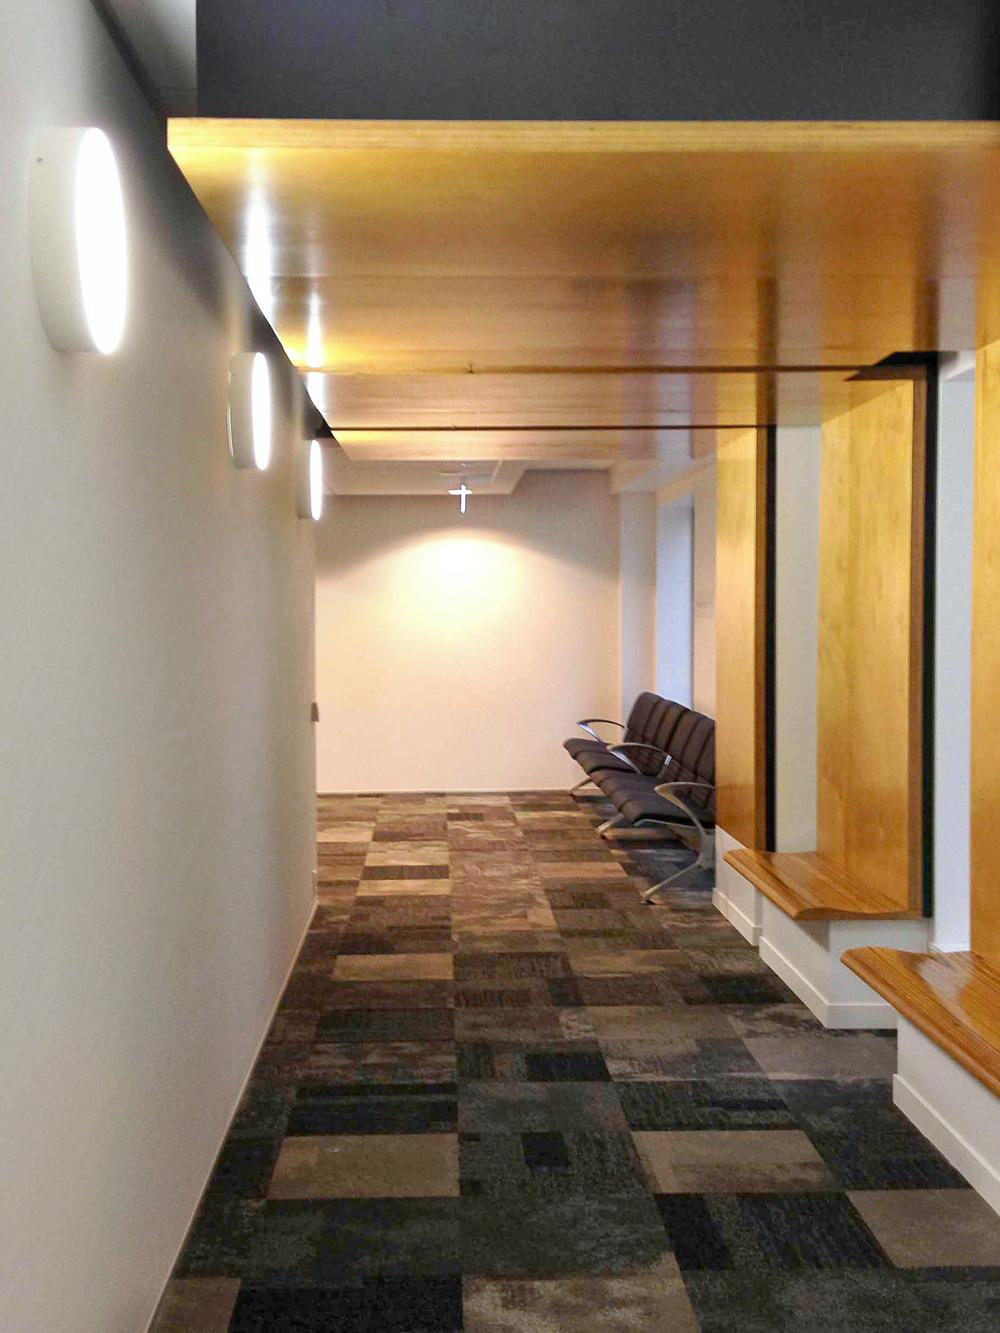 MOJ_IEE_Courts_Hallway_05.jpg